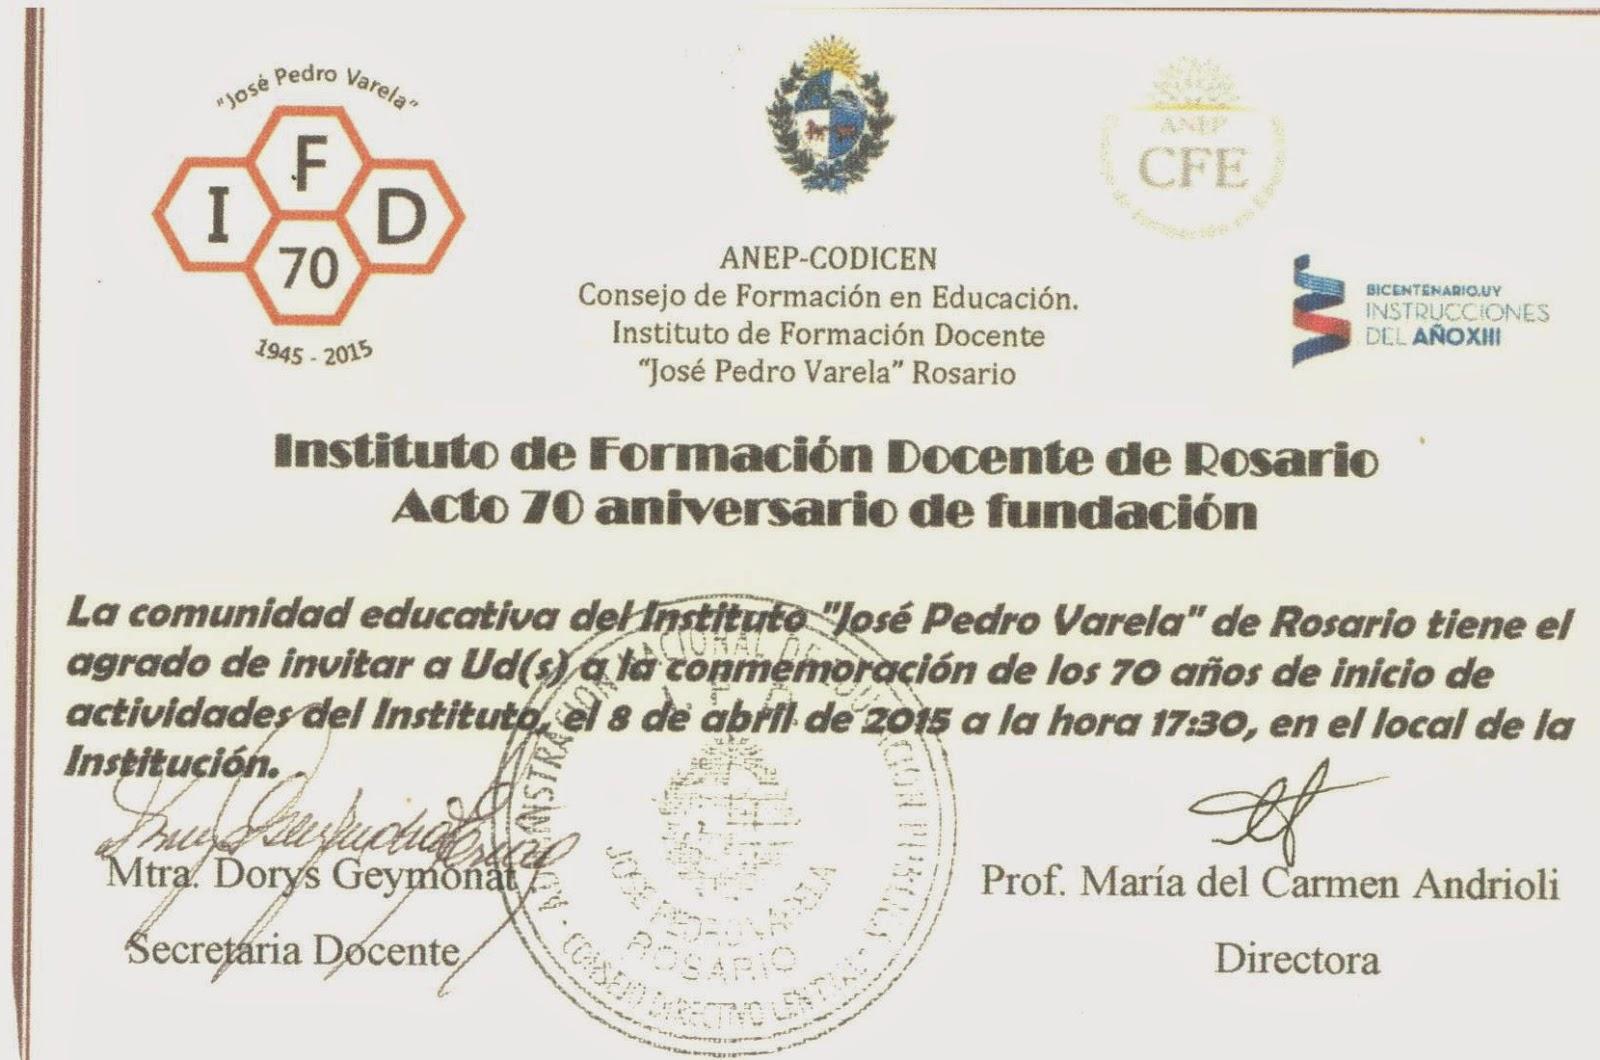 Instituto de formaci n docente mercedes mario a for Instituto formacion docente